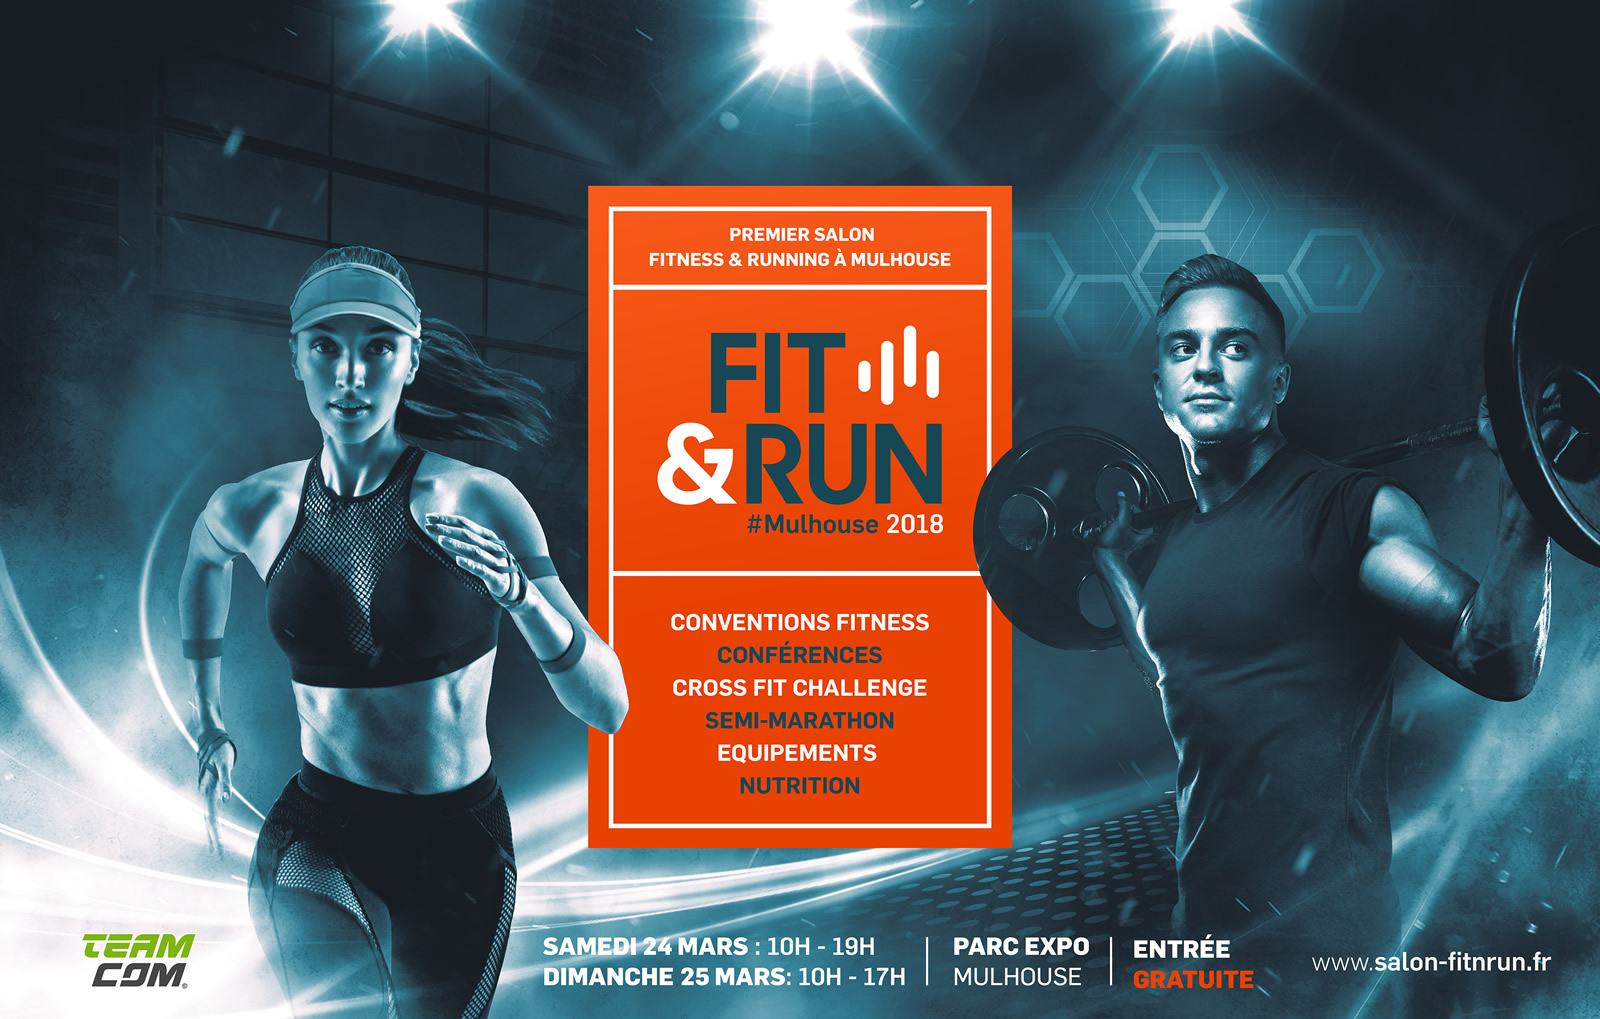 Salon Fit&Run - Parc expo - MULHOUSE 24 & 25 mars 2018